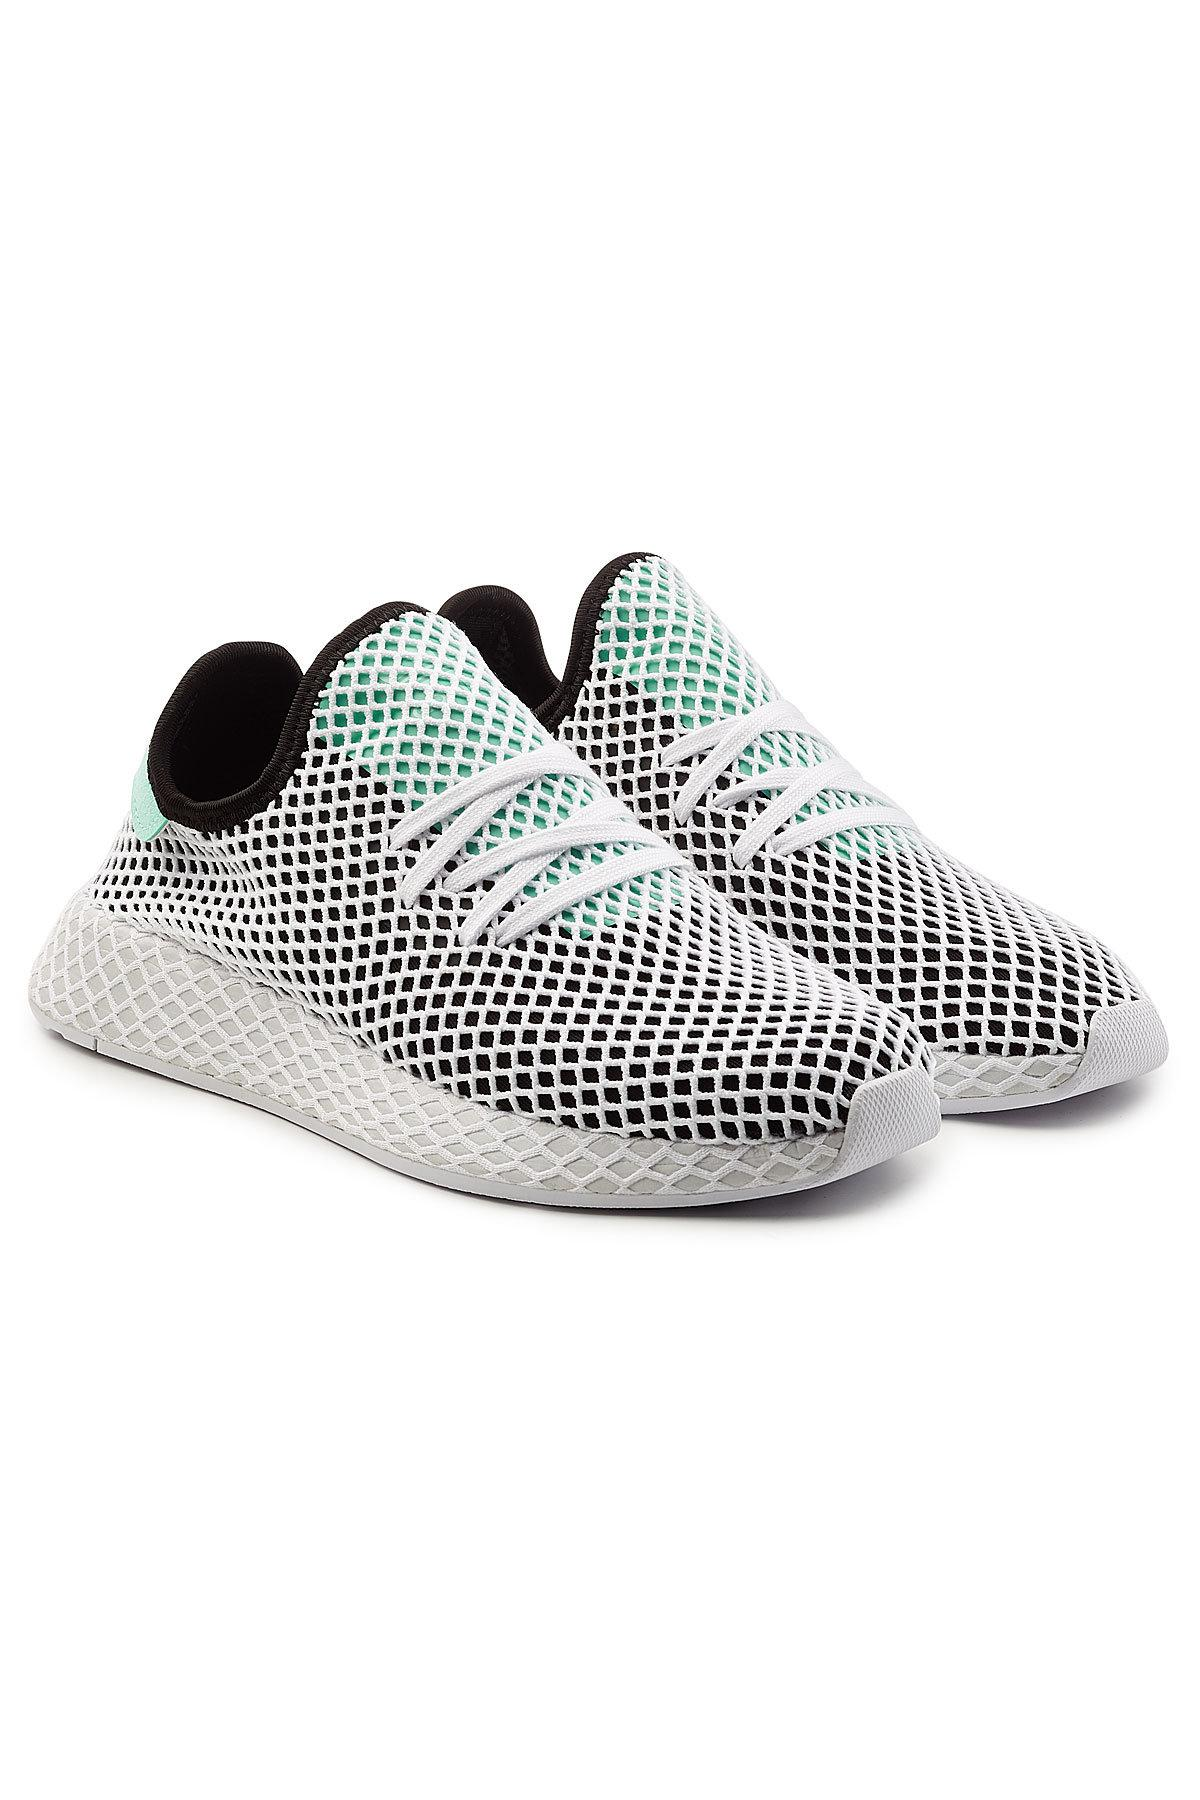 bd08bb1ab6543 Adidas Originals - Multicolor Deerupt Runner Sneakers for Men - Lyst